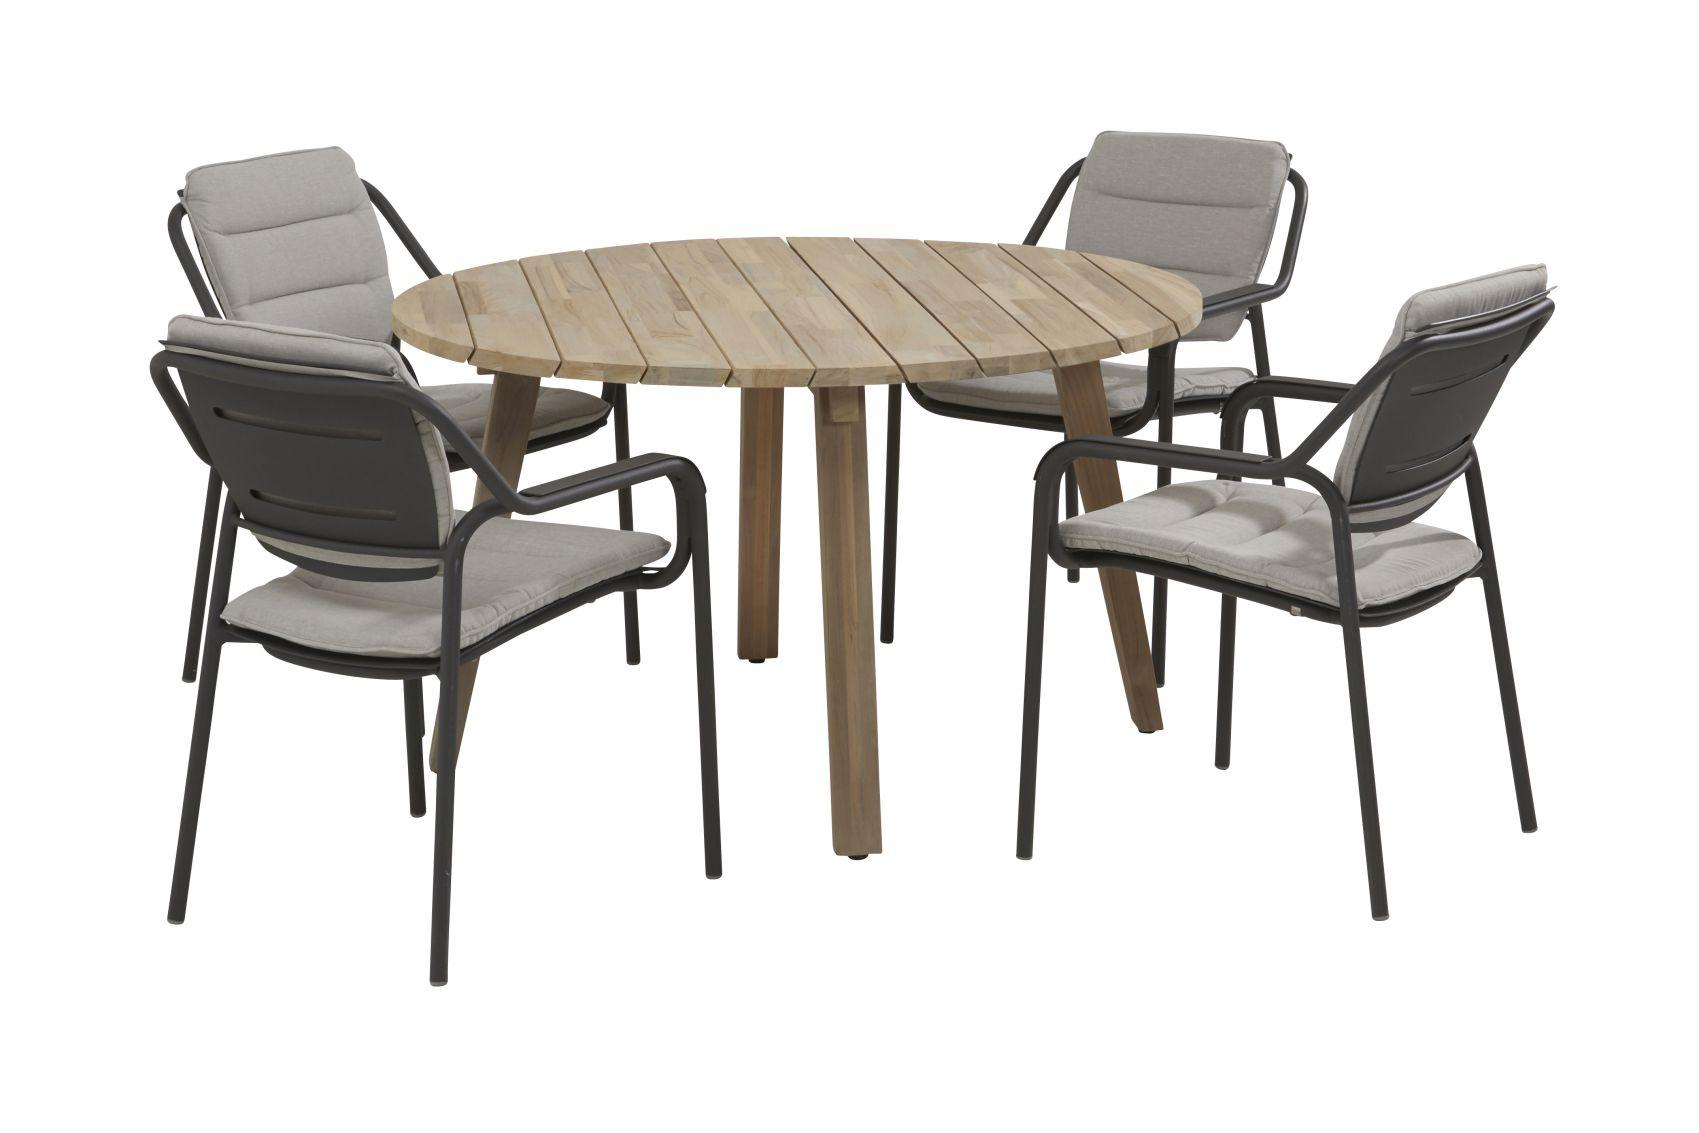 4 seasons outdoor eco dining set derby tafel rond sale latour. Black Bedroom Furniture Sets. Home Design Ideas